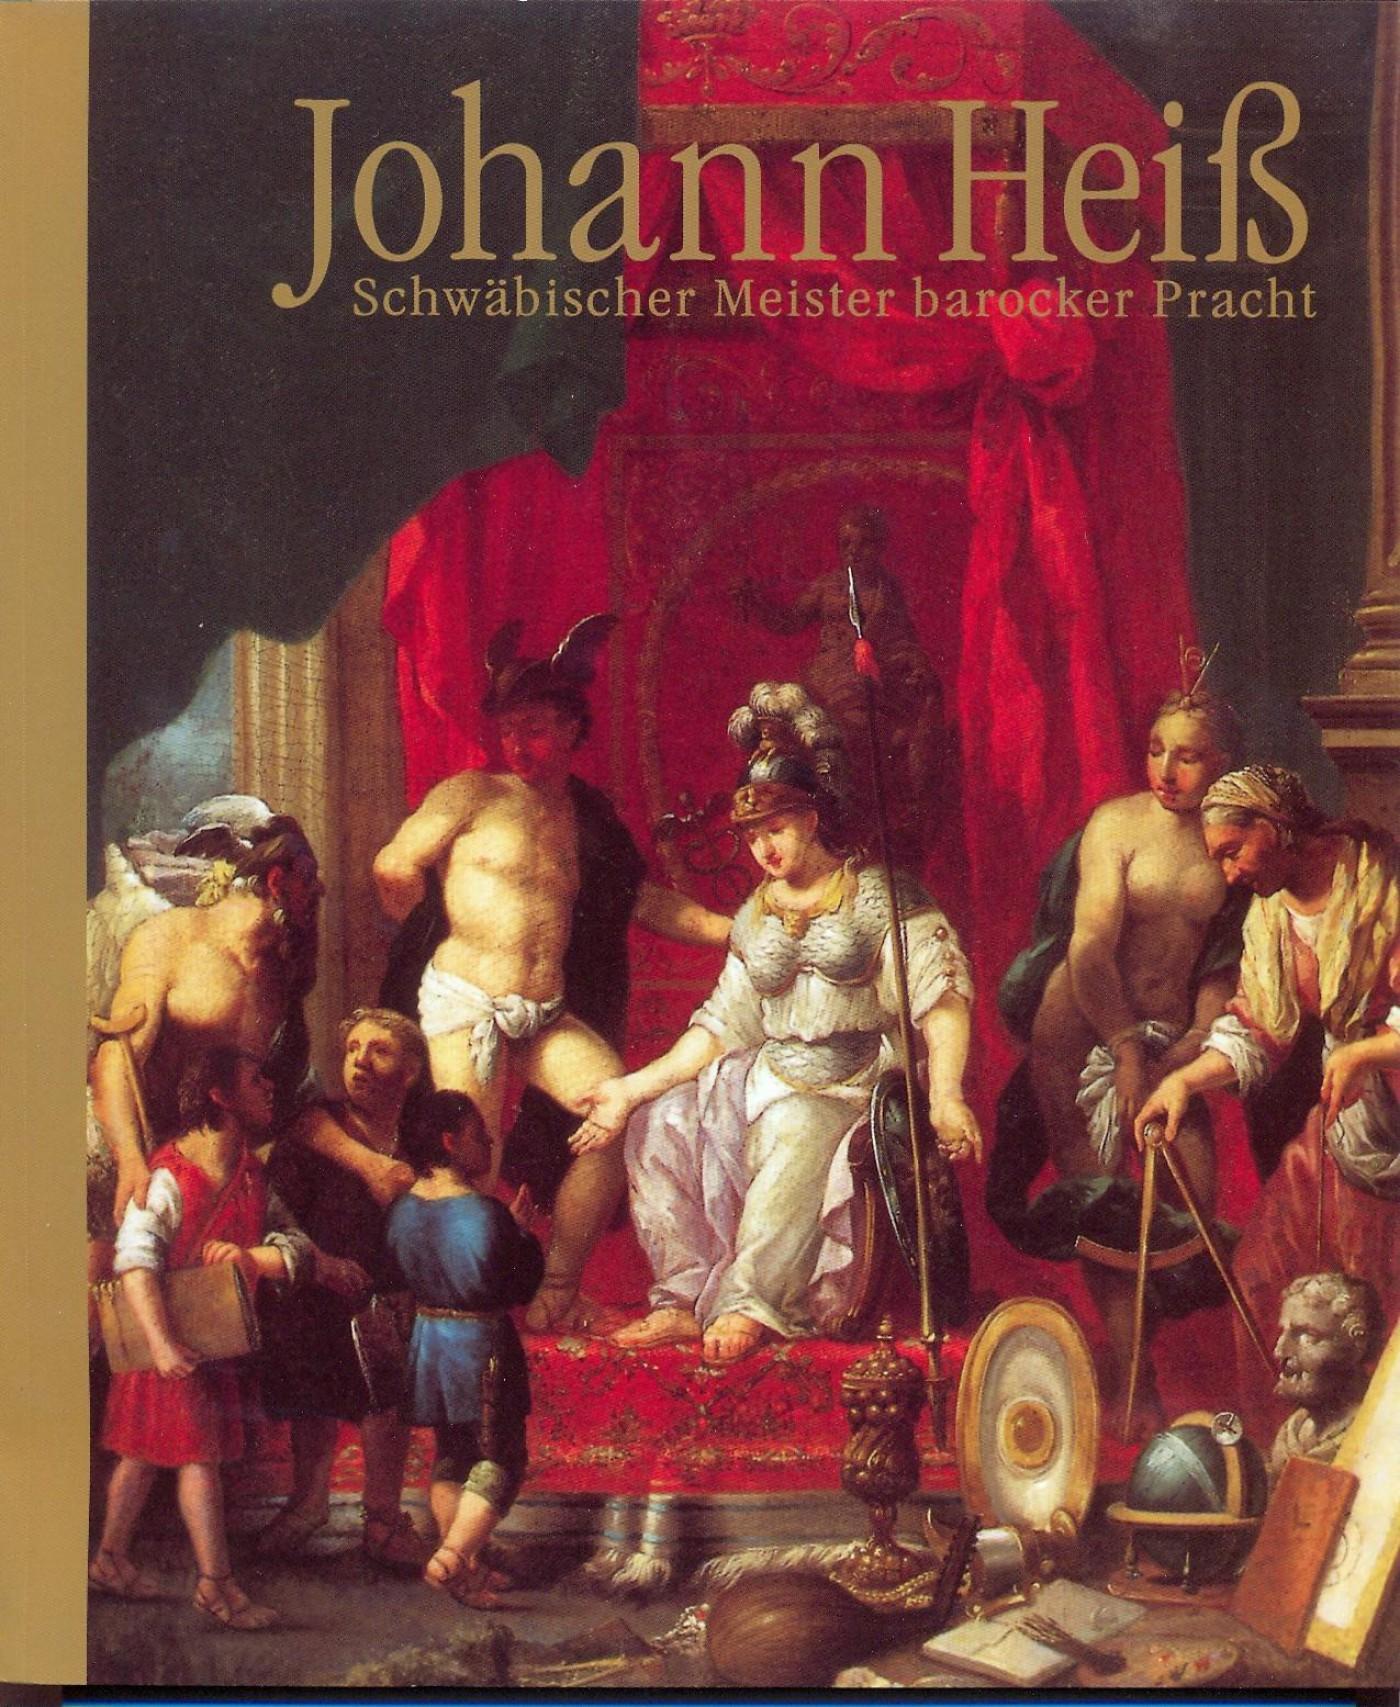 Katalog 'Johann Heiß'